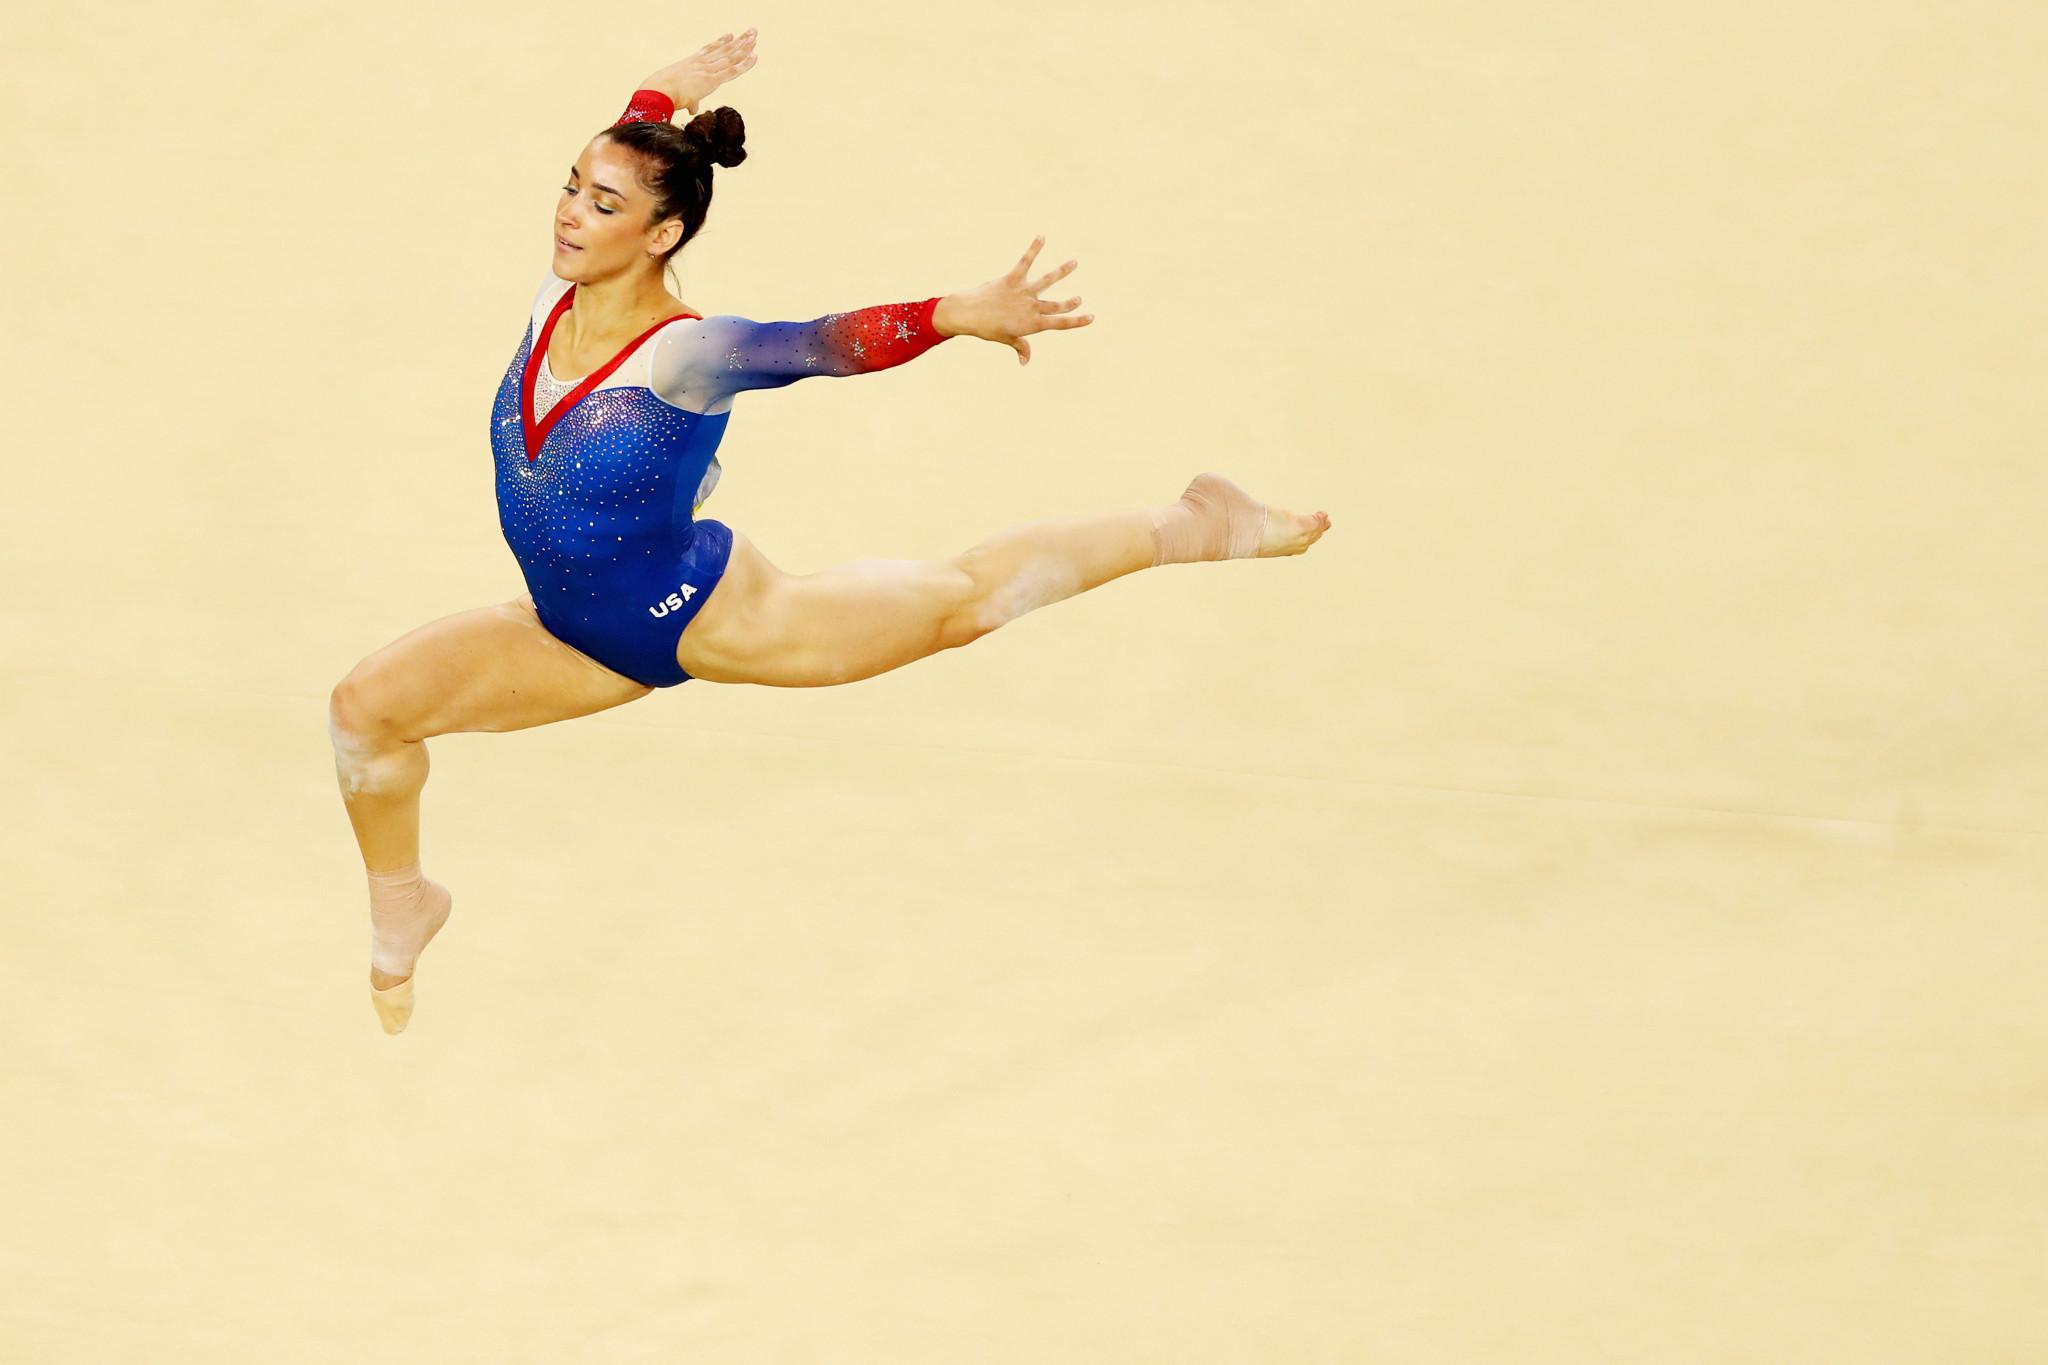 Olympic champion Raisman questions appointment of Mary Bono as USA Gymnastics chief